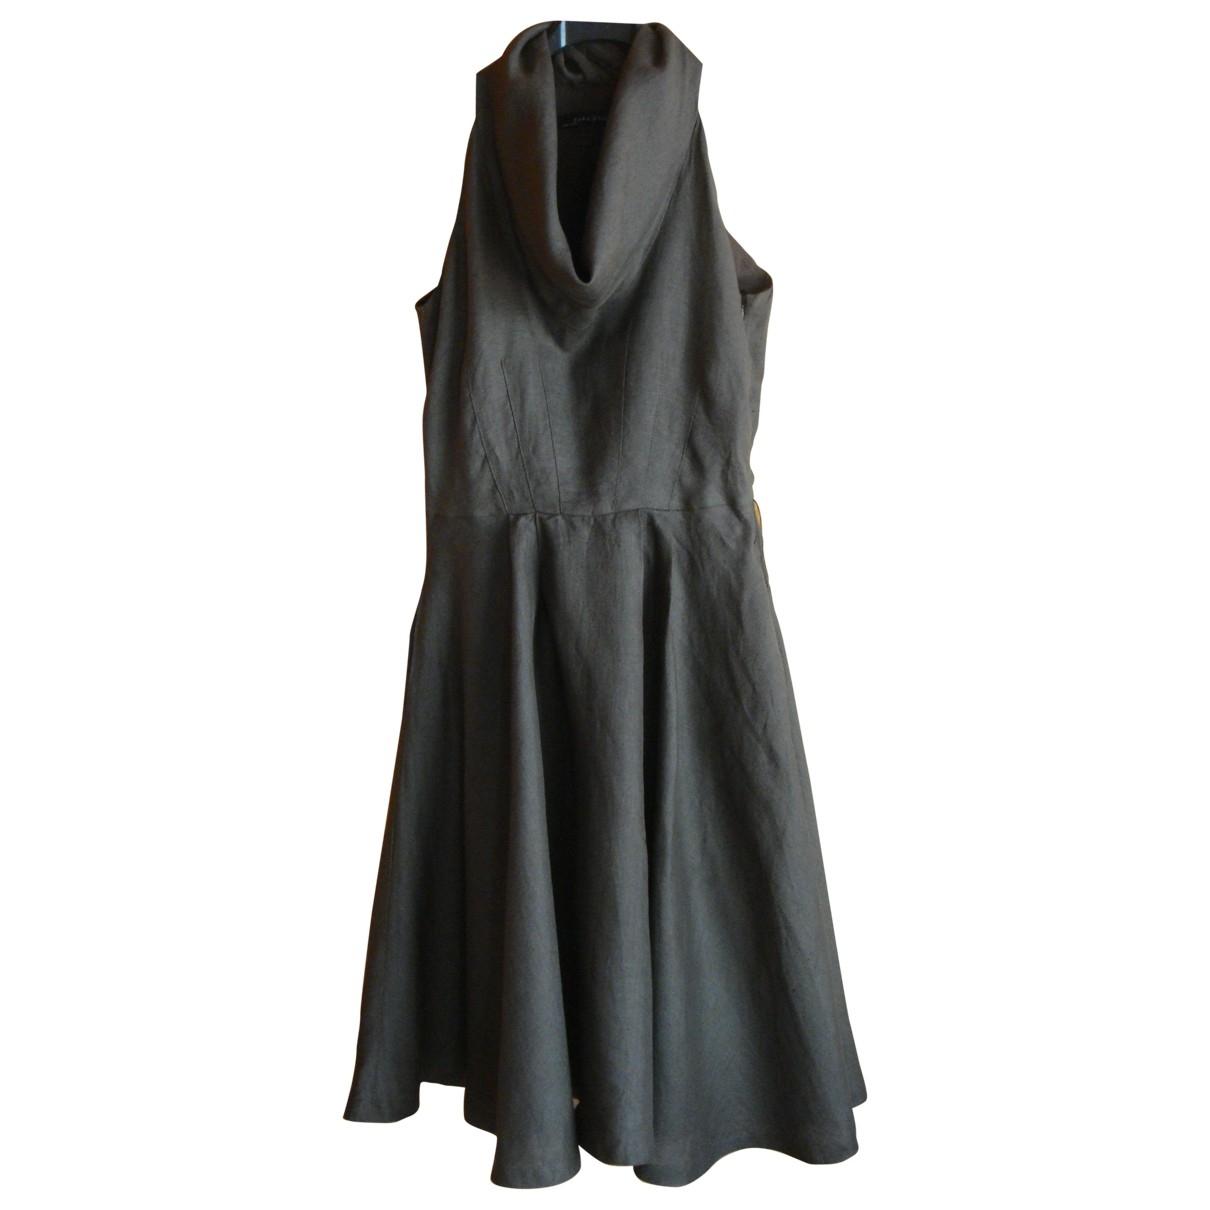 Zara \N Khaki Linen dress for Women XXXL International